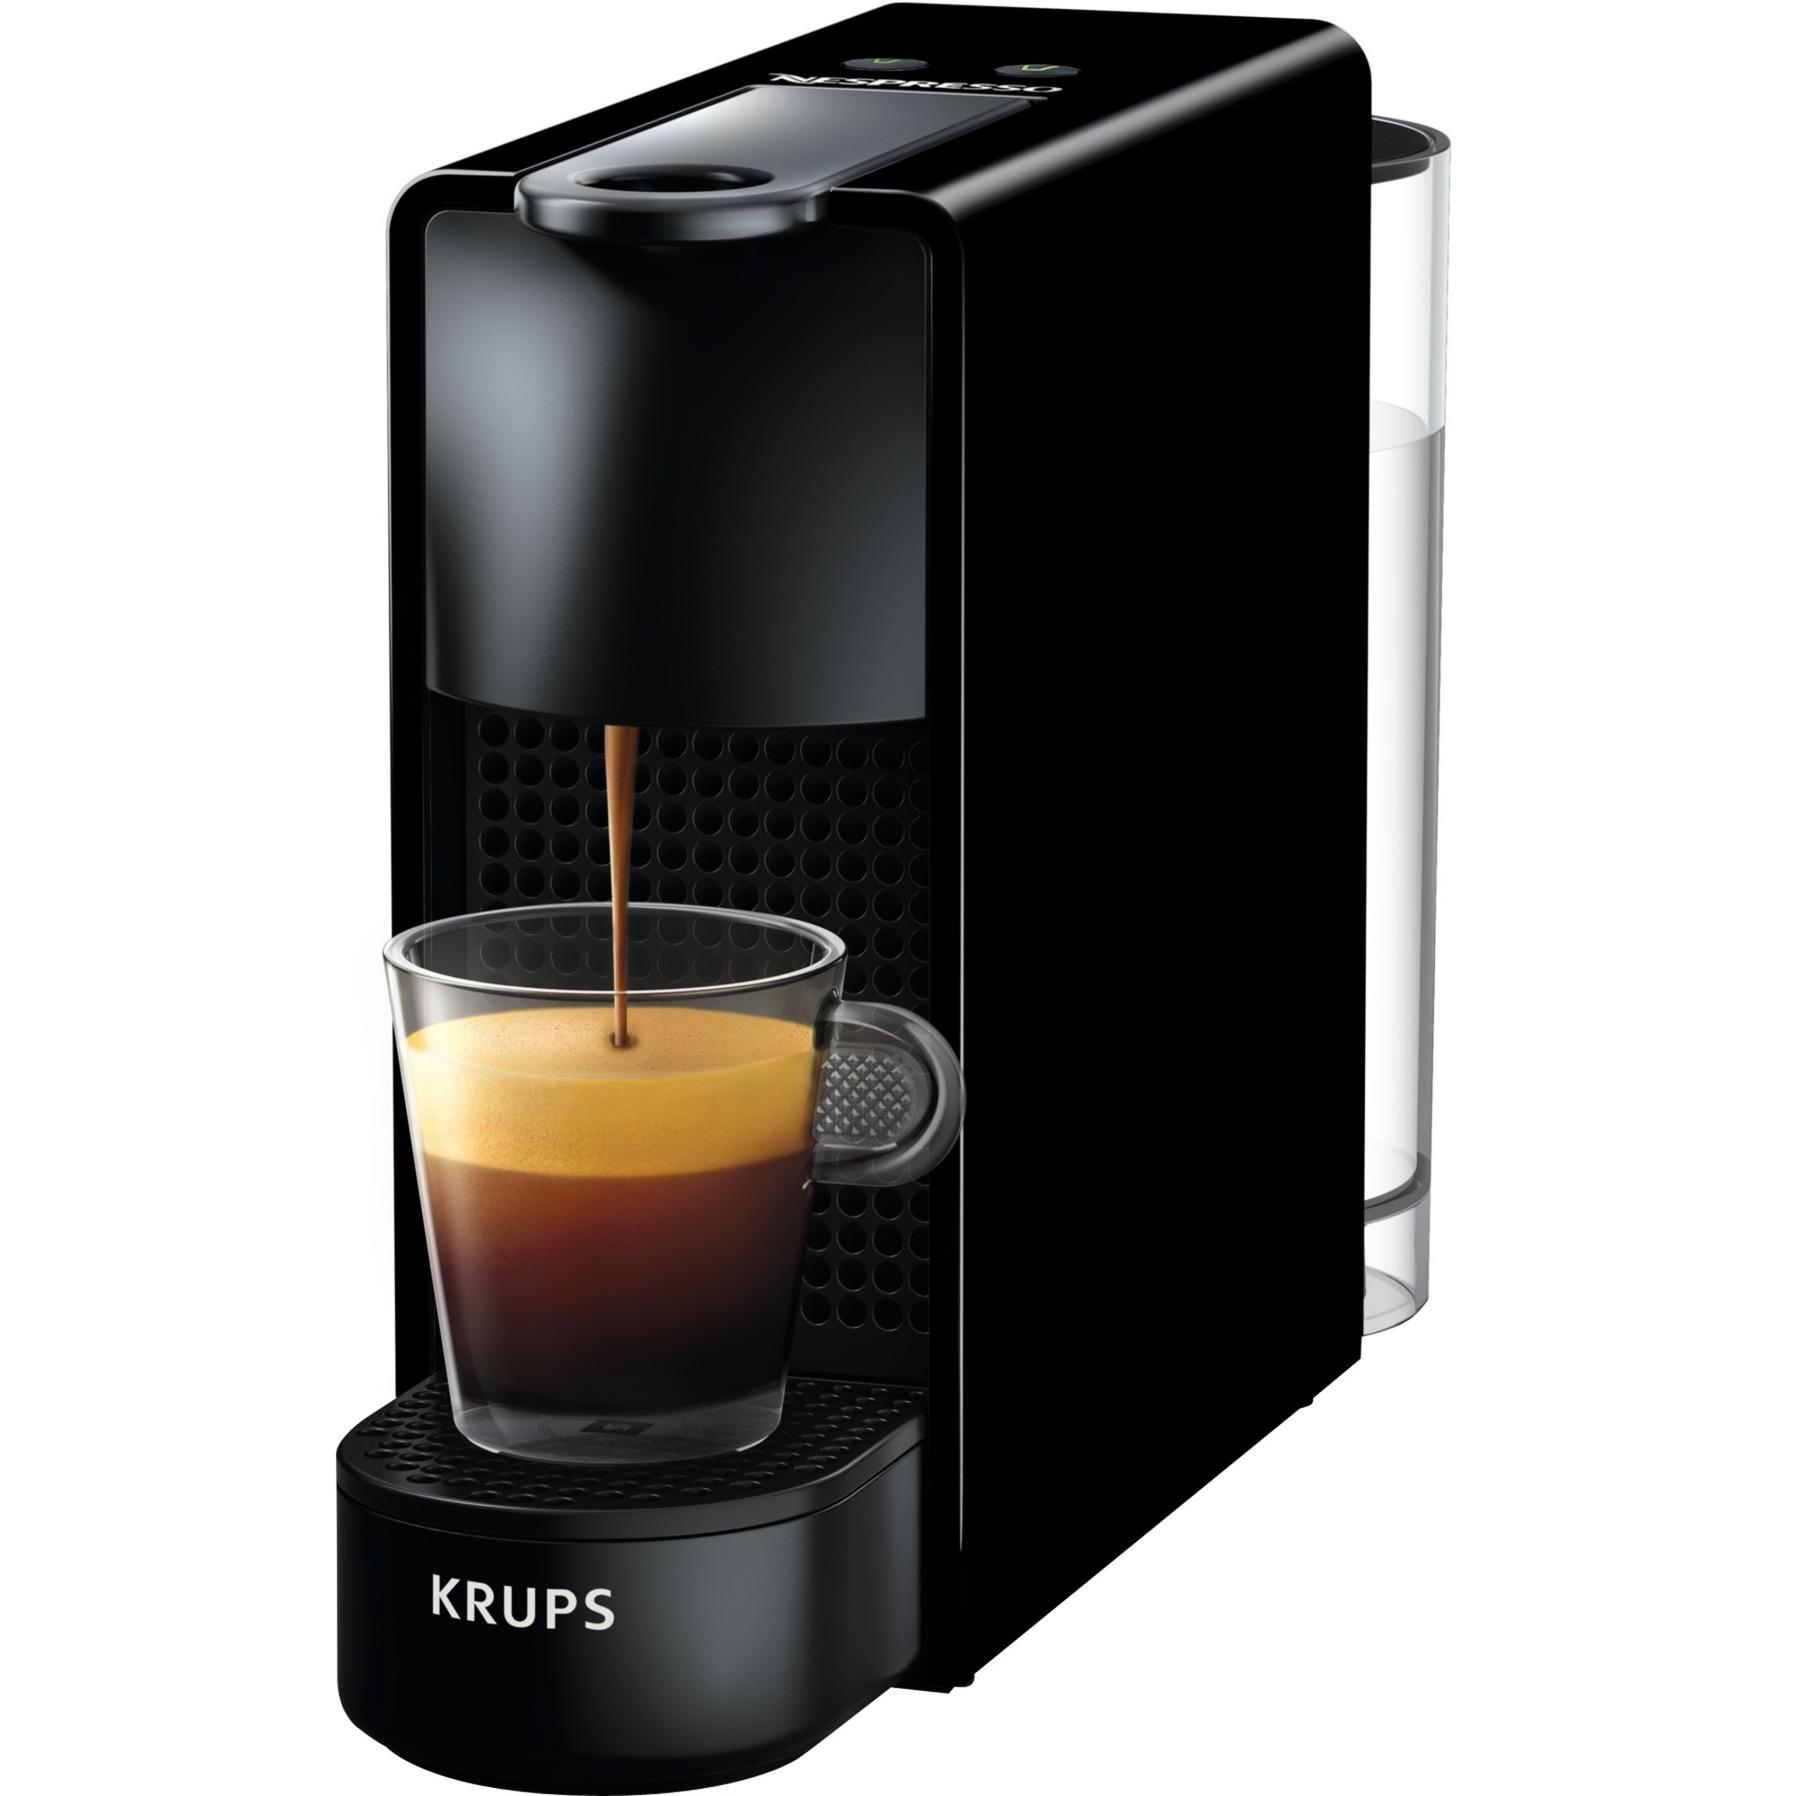 Essenza Mini XN110810 Independiente Máquina de café en cápsulas Negro 0,6 L 1 tazas Manual, Cafetera de cápsulas